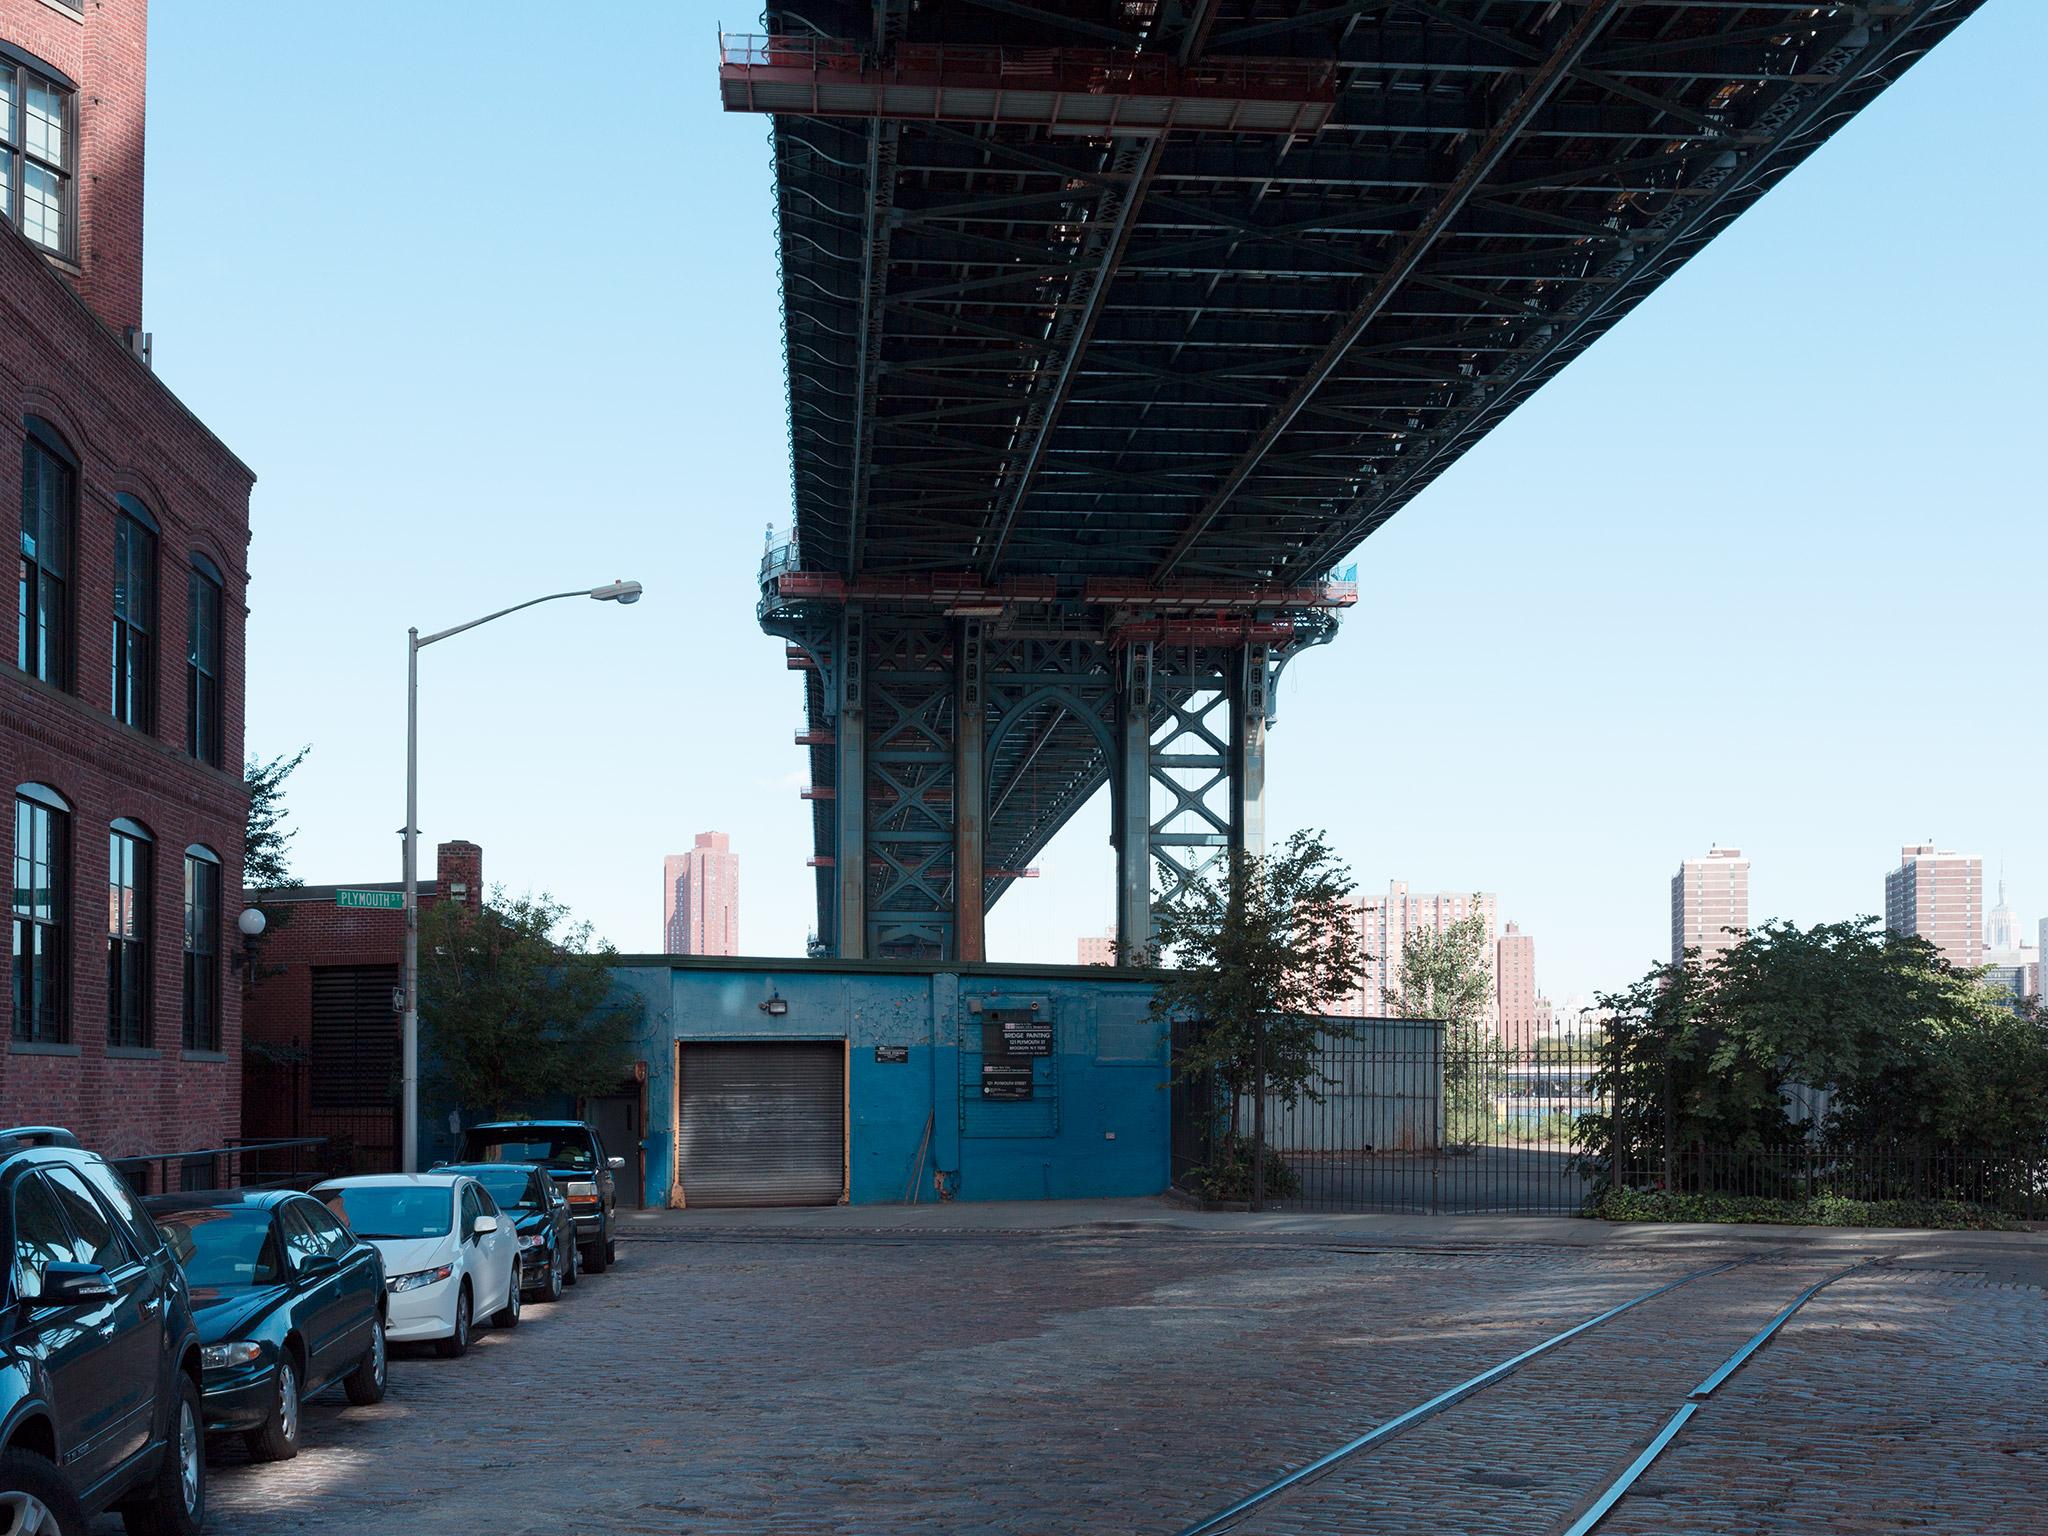 Bridge overhead   DUMBO September 16th, 2012   Adams Street and Plymouth Street  40.703522, -73.988767